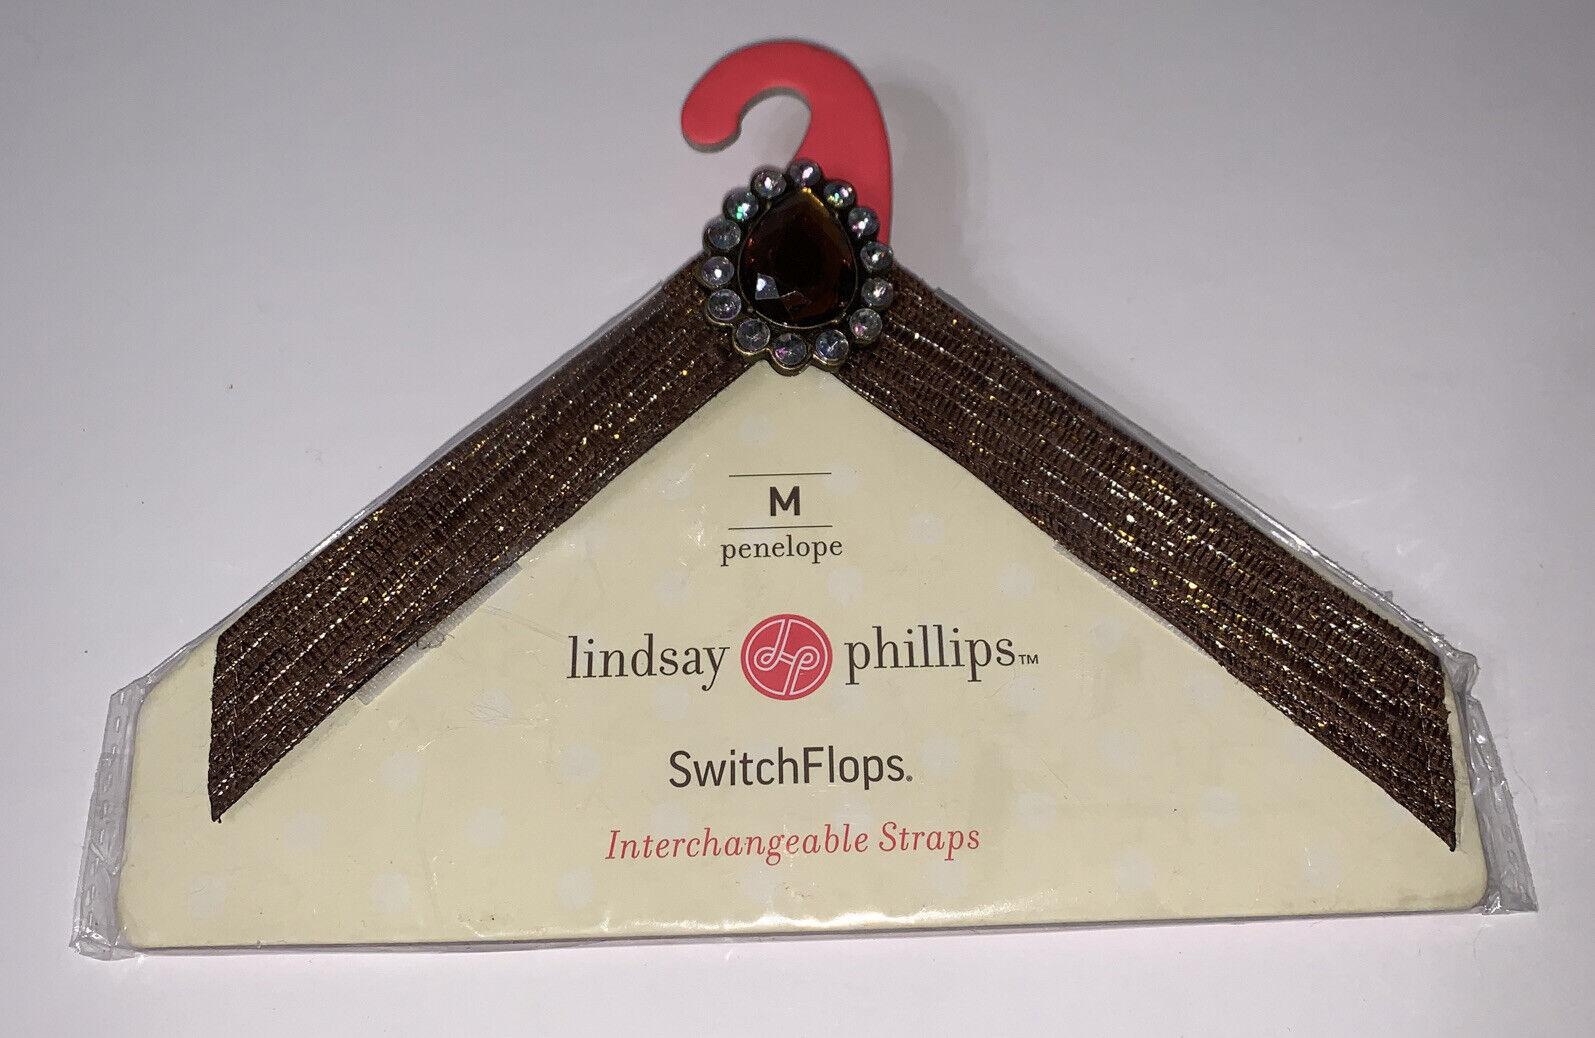 New NIP Lindsay Phillips Switchflop Straps Penelope Sz M 7/8 Brown Faux Stones